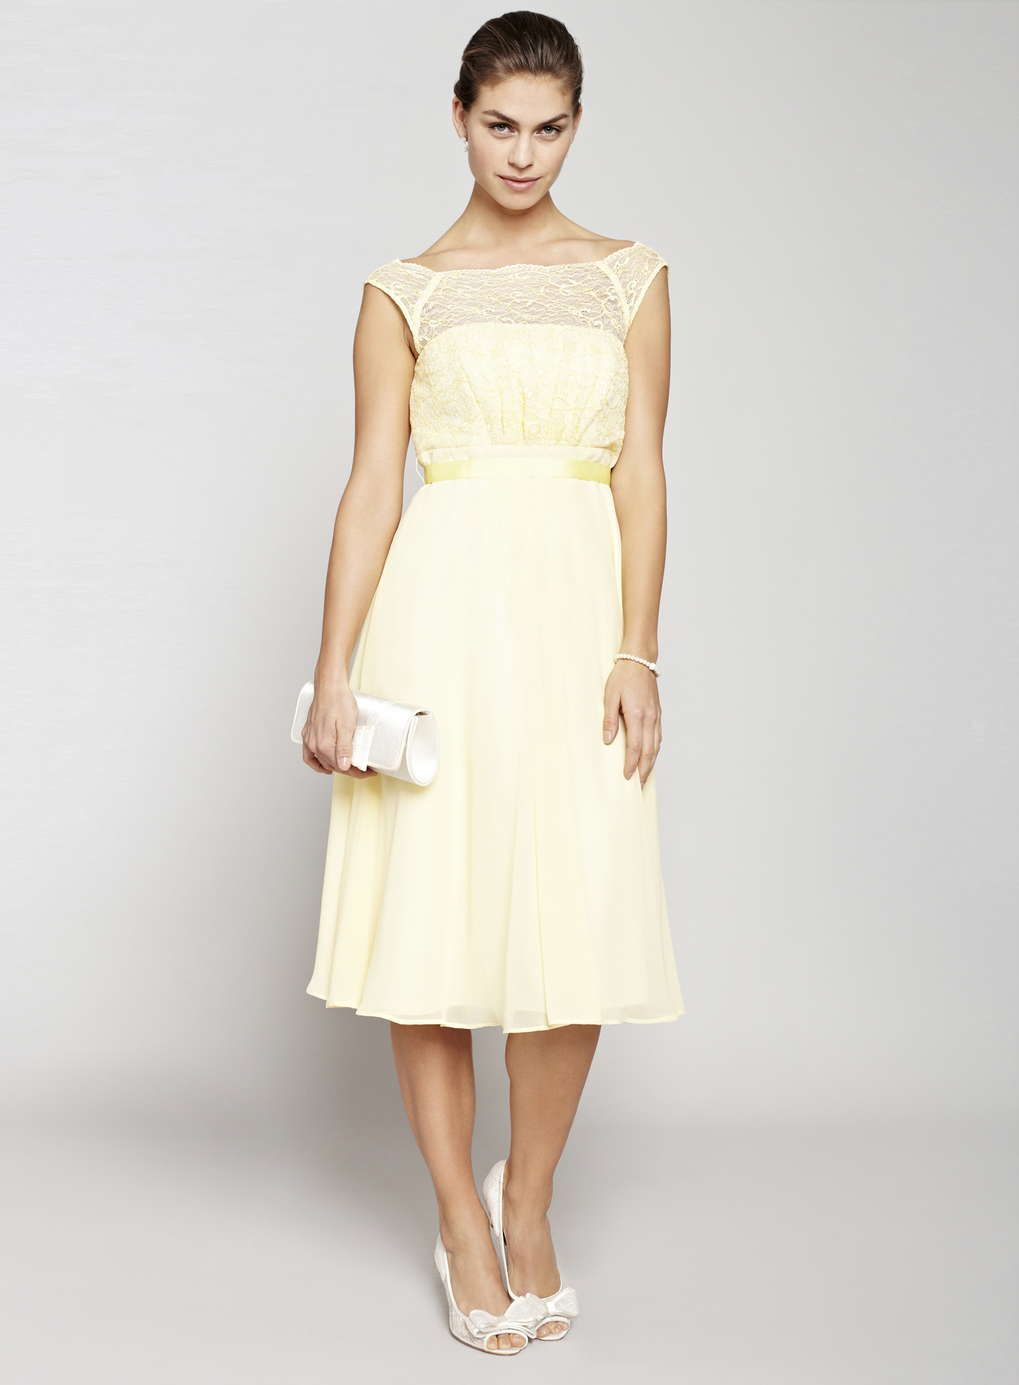 Lemon chloe bridesmaid dress bhs always the bridesmaid lemon chloe bridesmaid dress bhs ombrellifo Images